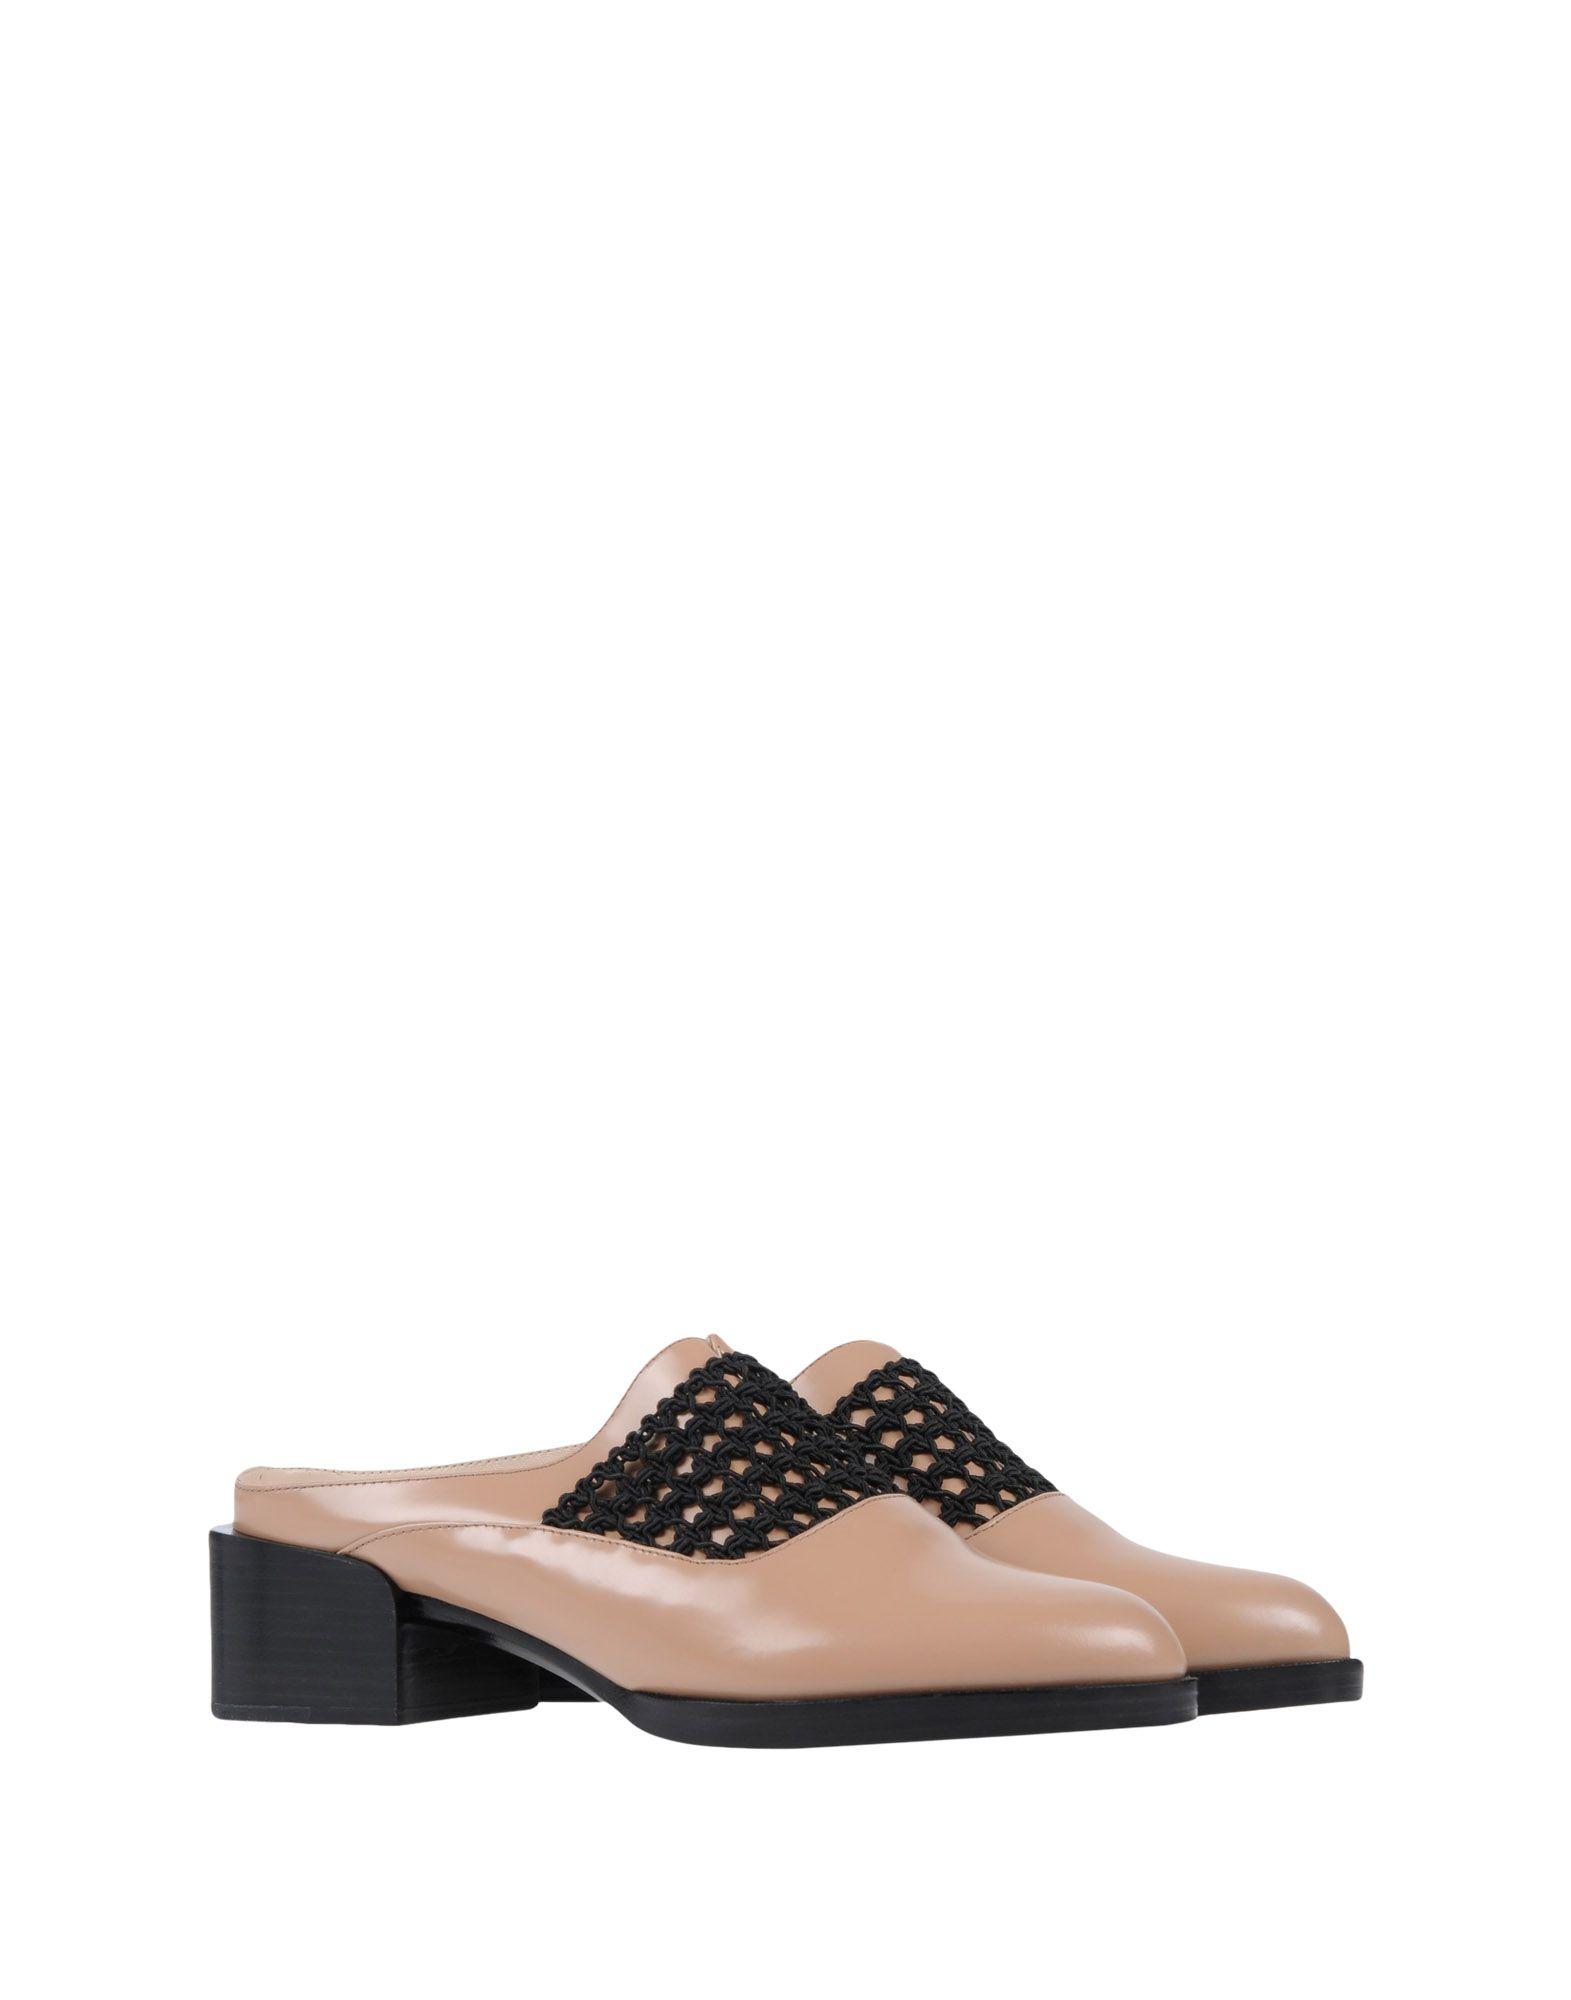 Rabatt Schuhe 3.1 Phillip Lim Pantoletten Damen  11464593SB